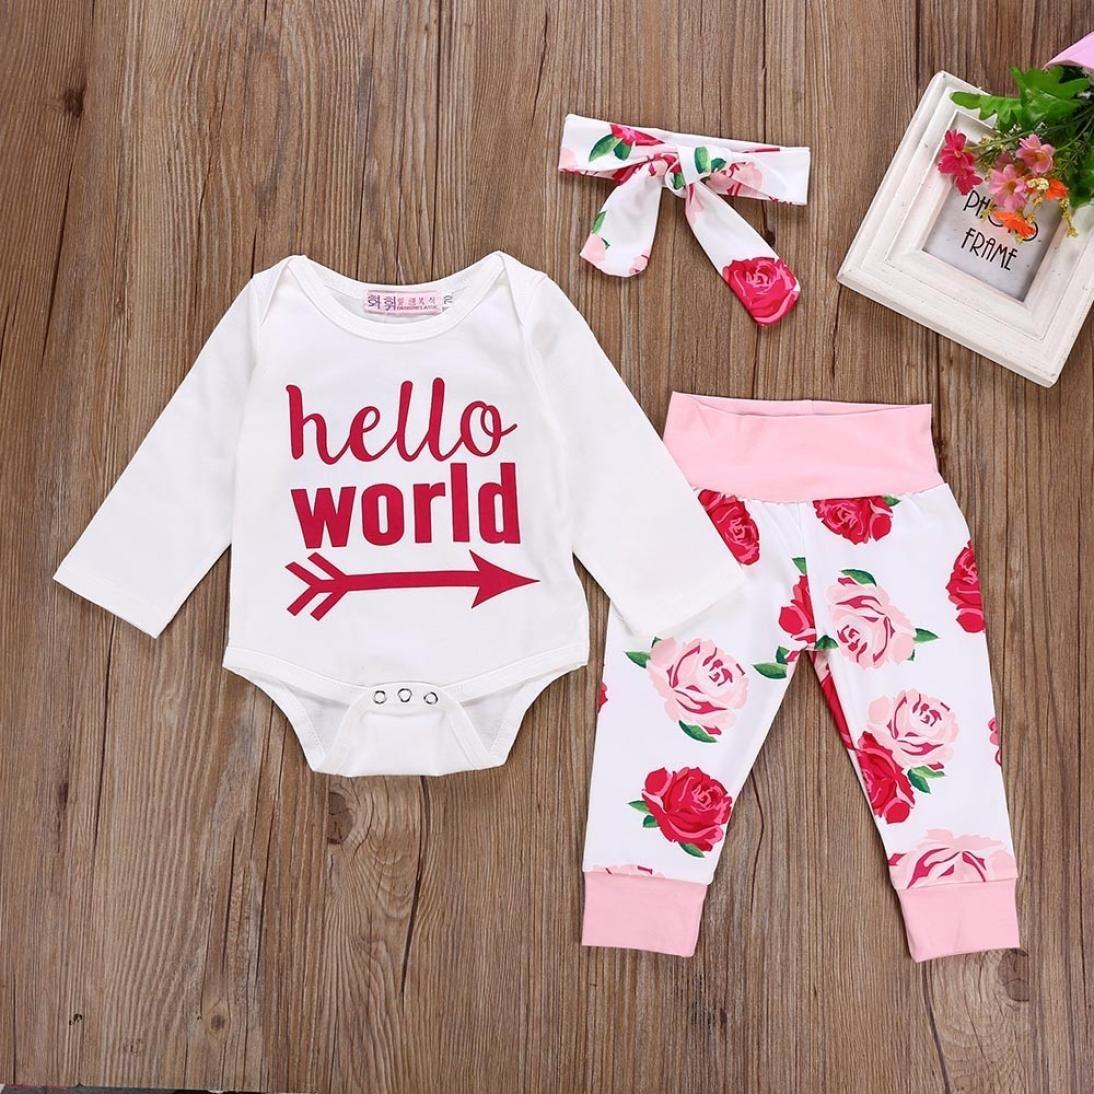 4e47874d5a4 FeiliandaJJ Baby Girl Romper Suits